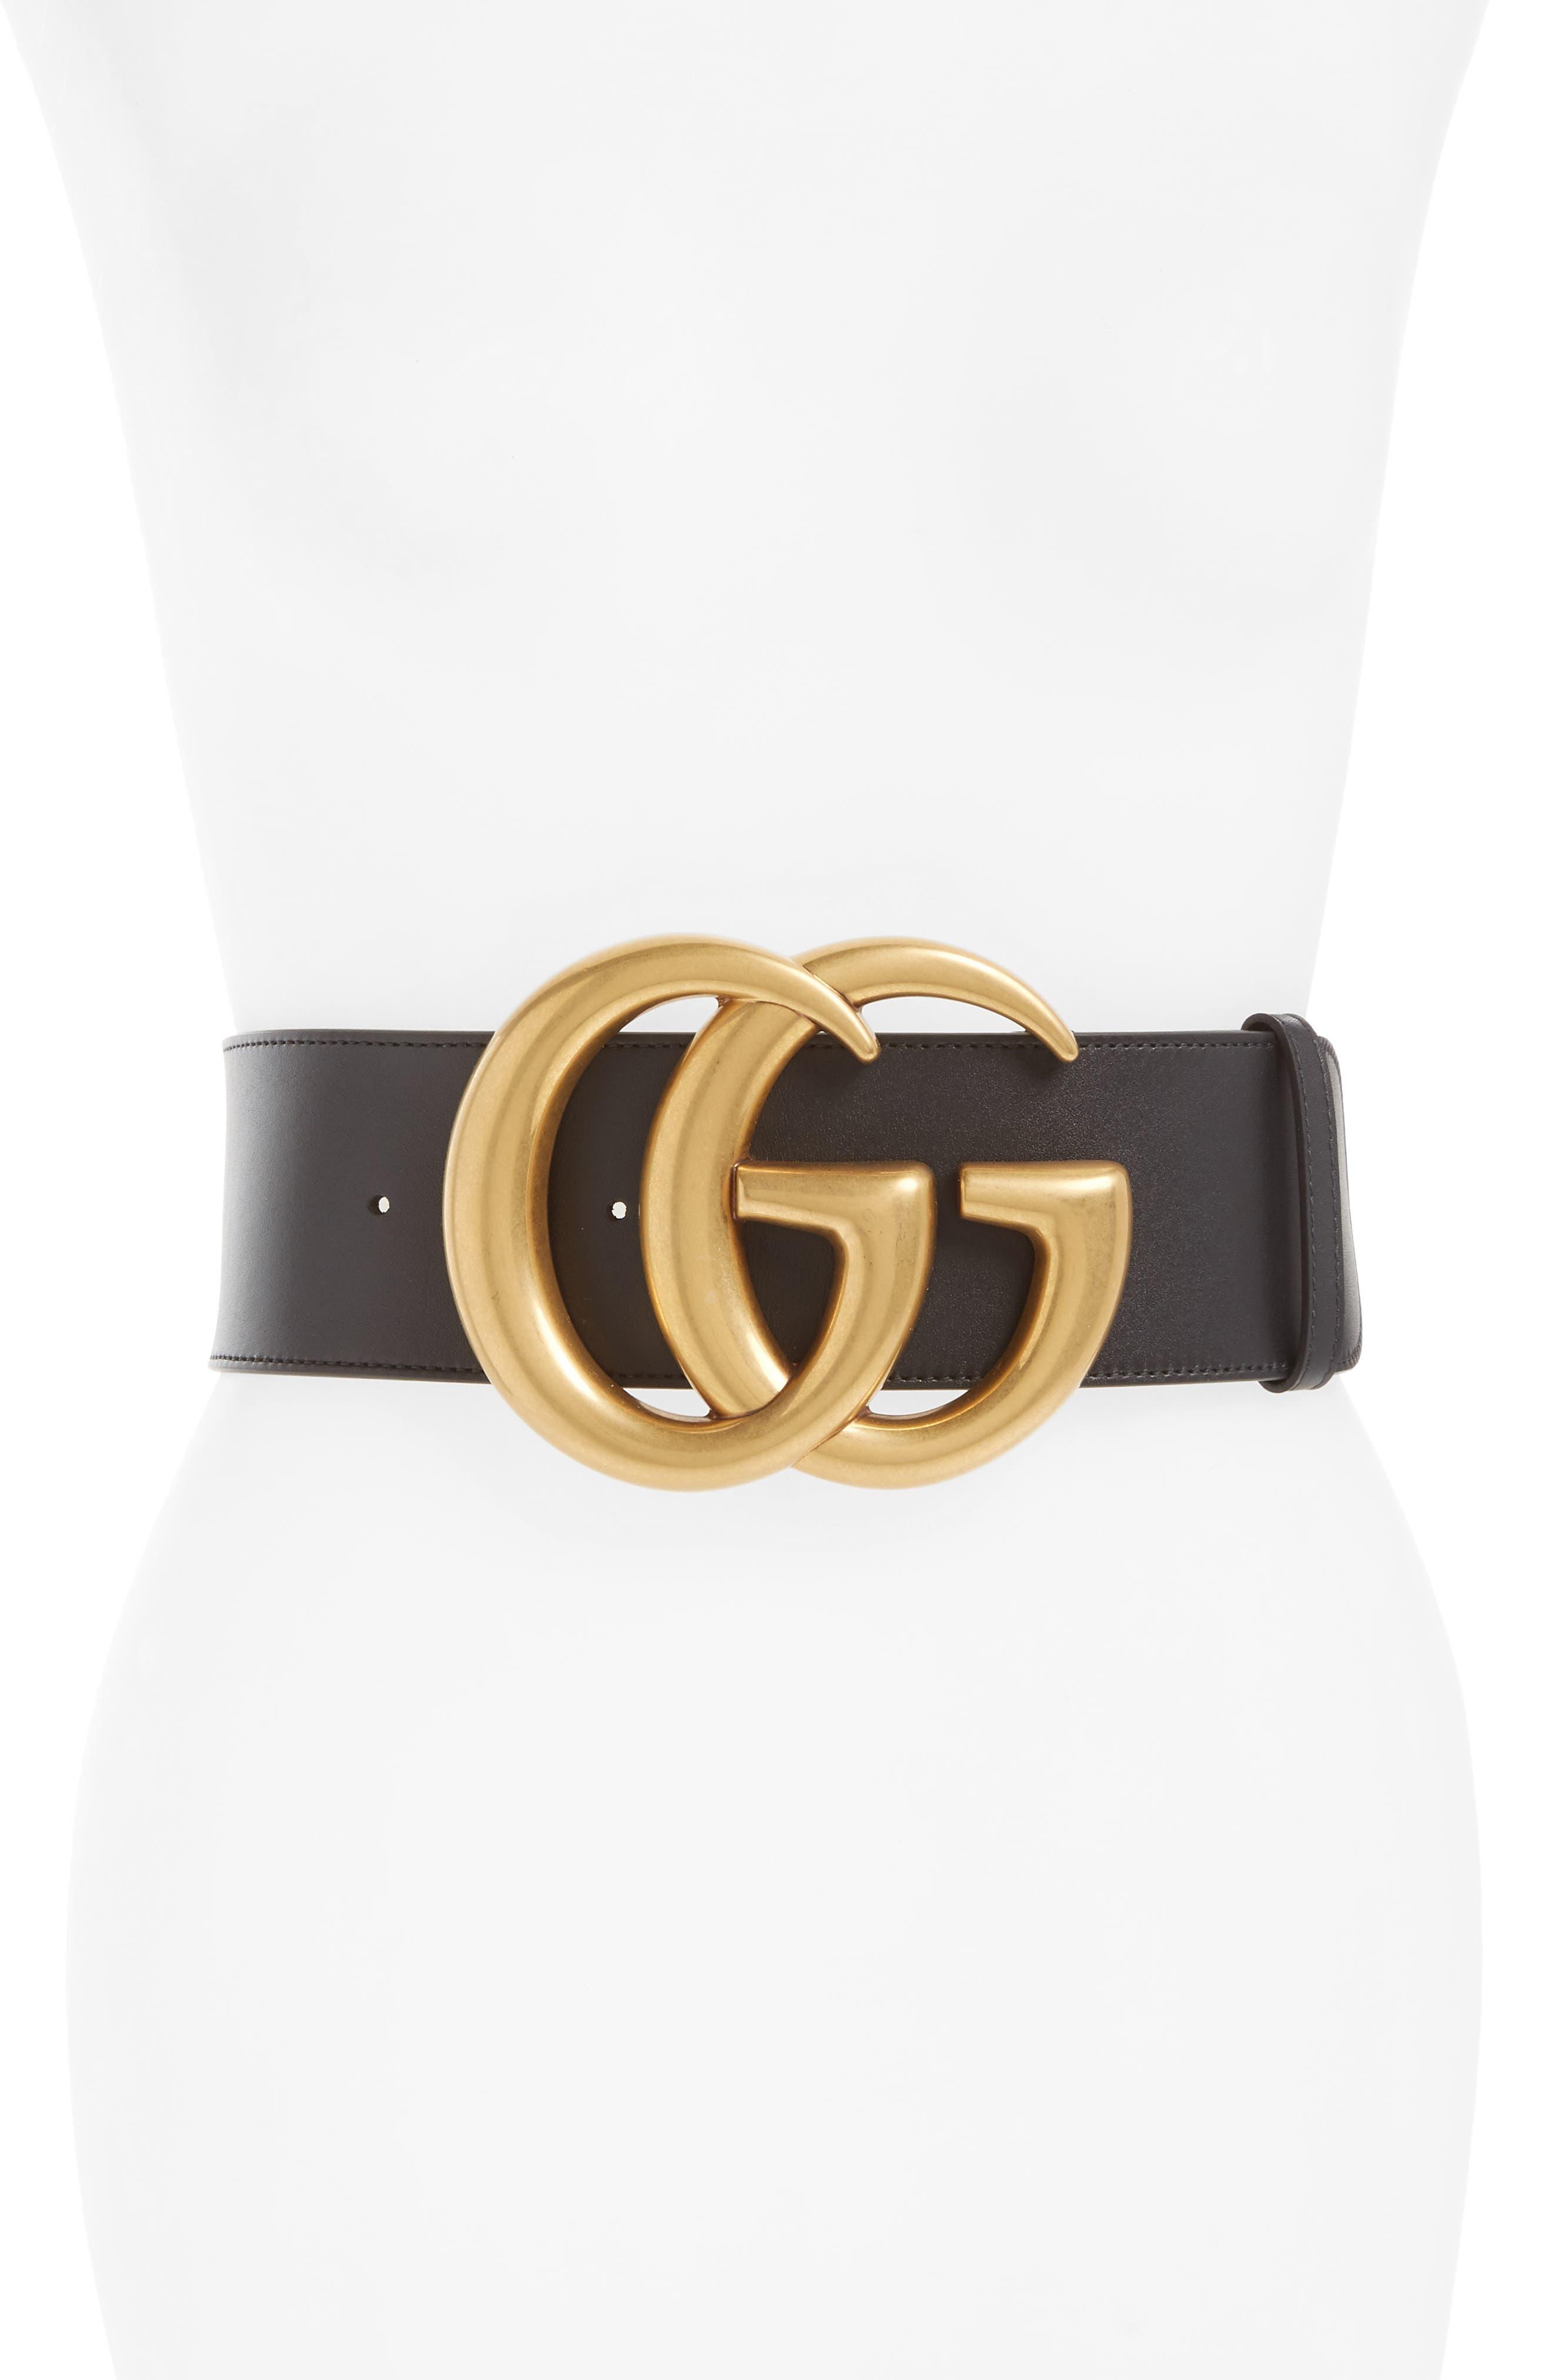 GG Leather Belt,                             Main thumbnail 1, color,